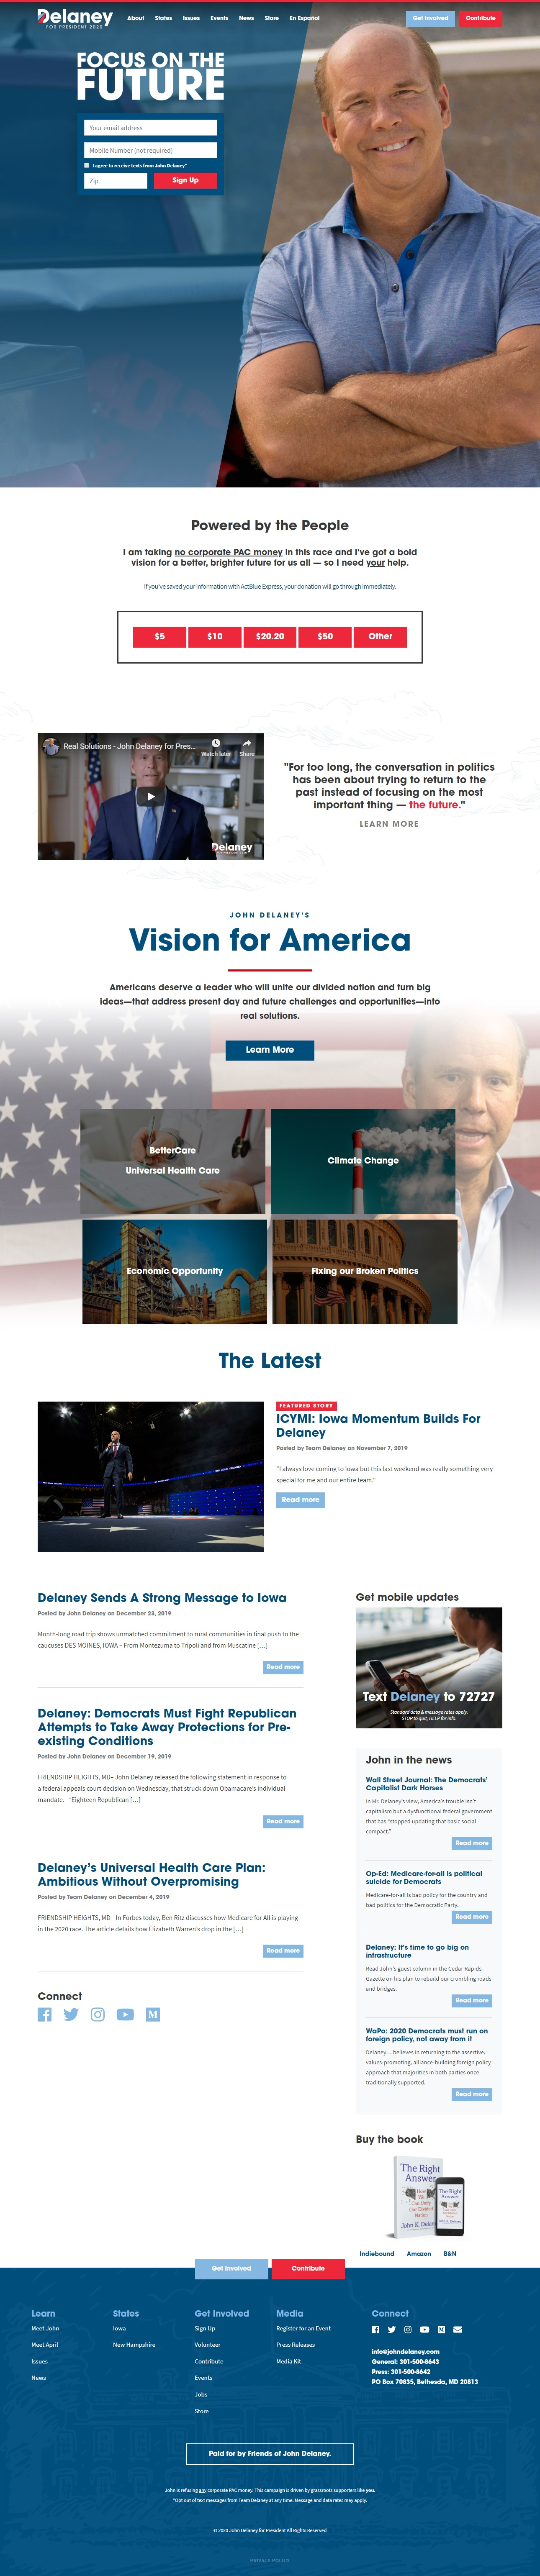 Homepage Snapshot for January 1, 2020: Former Representative John Delaney